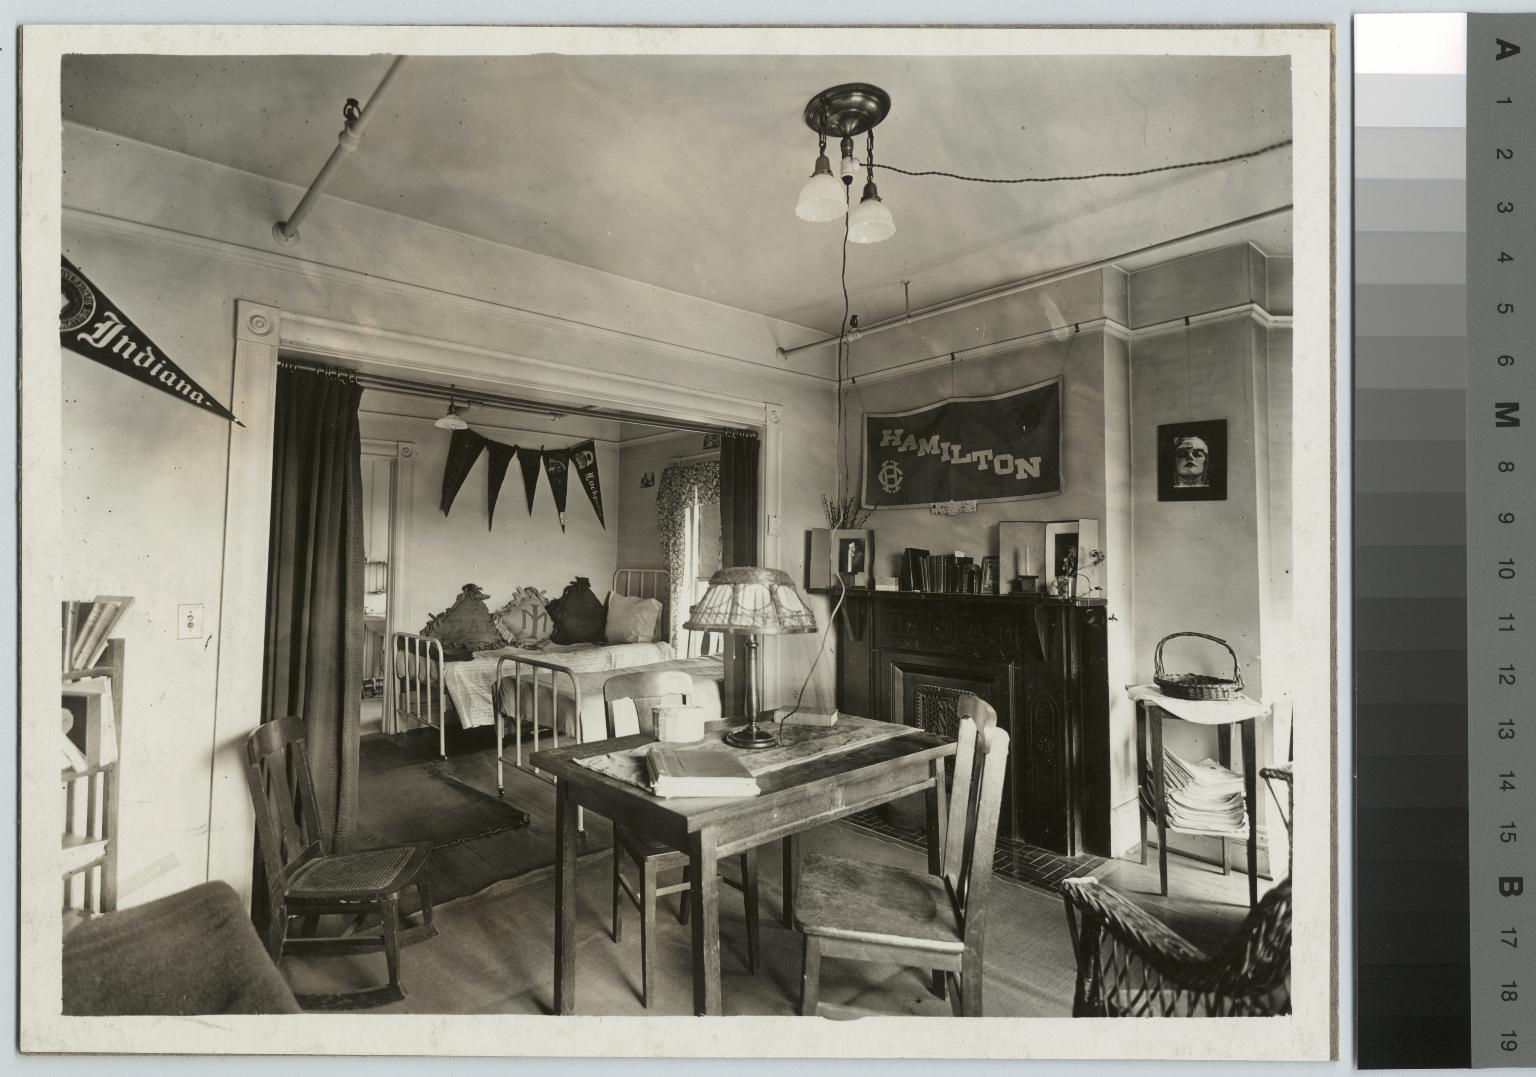 Interior view, girls' dormitory, Rochester Athenaeum and Mechanics Institute